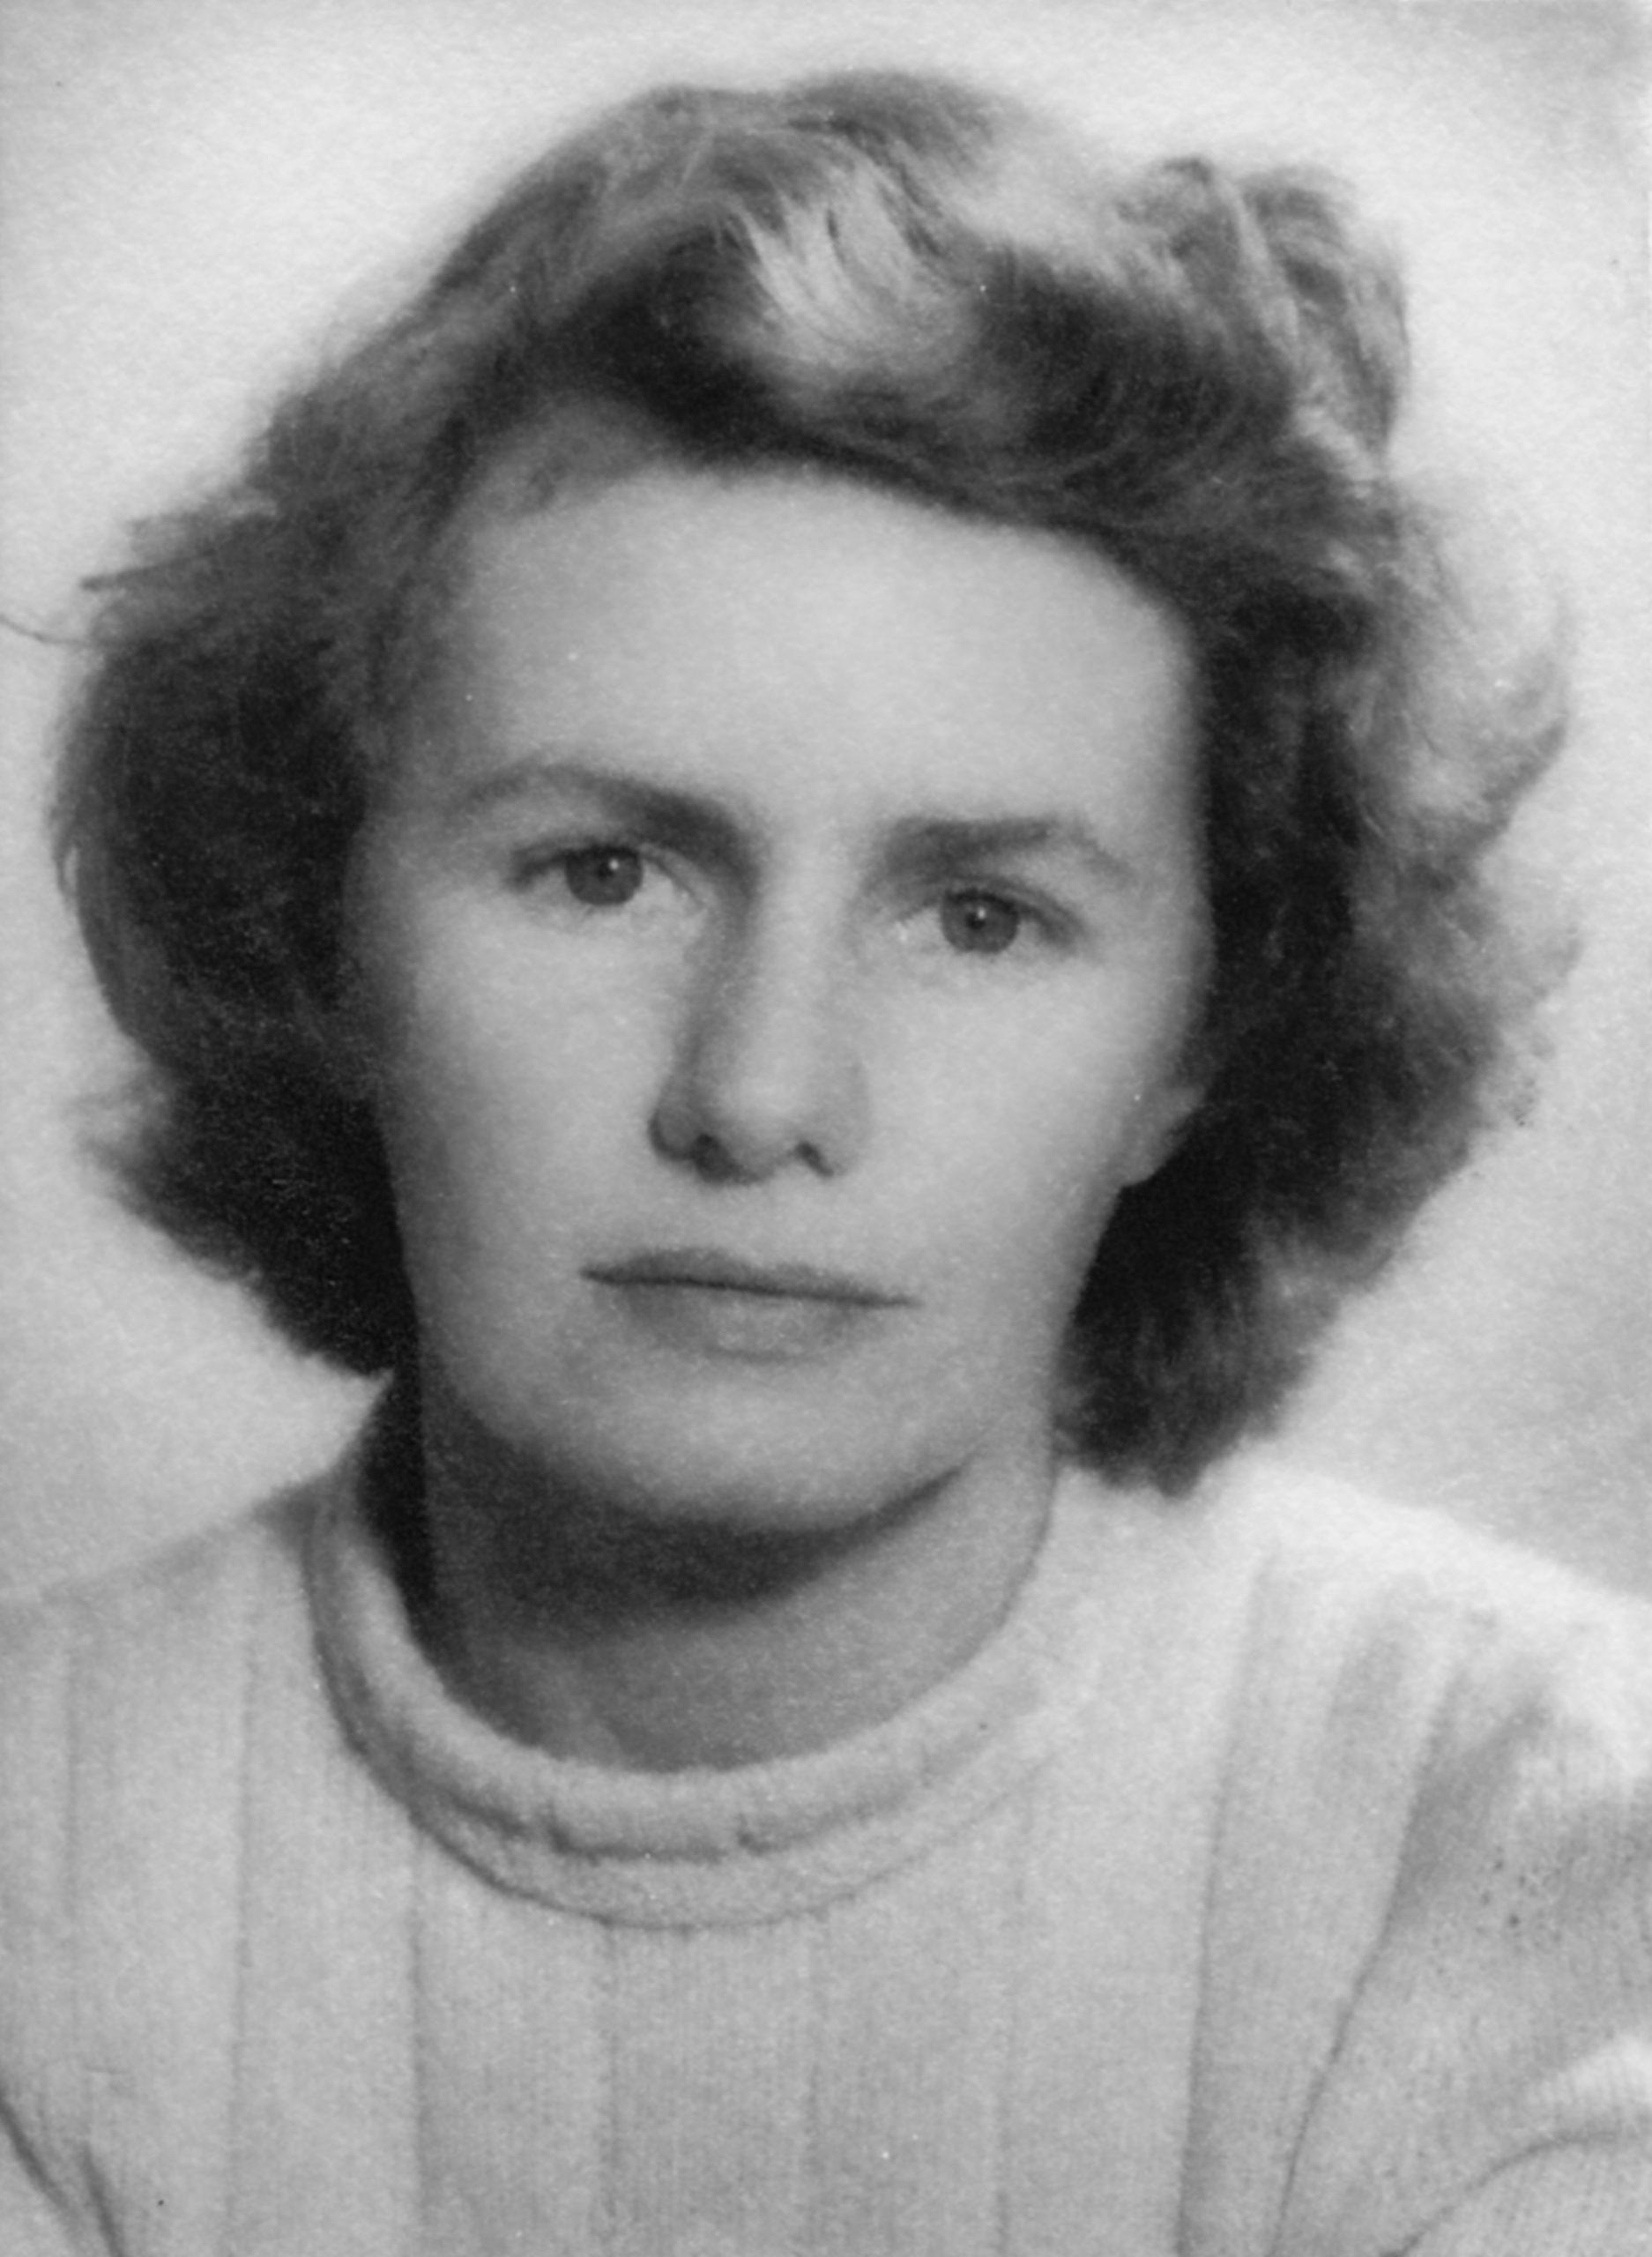 Enid Toner, circa 1940s